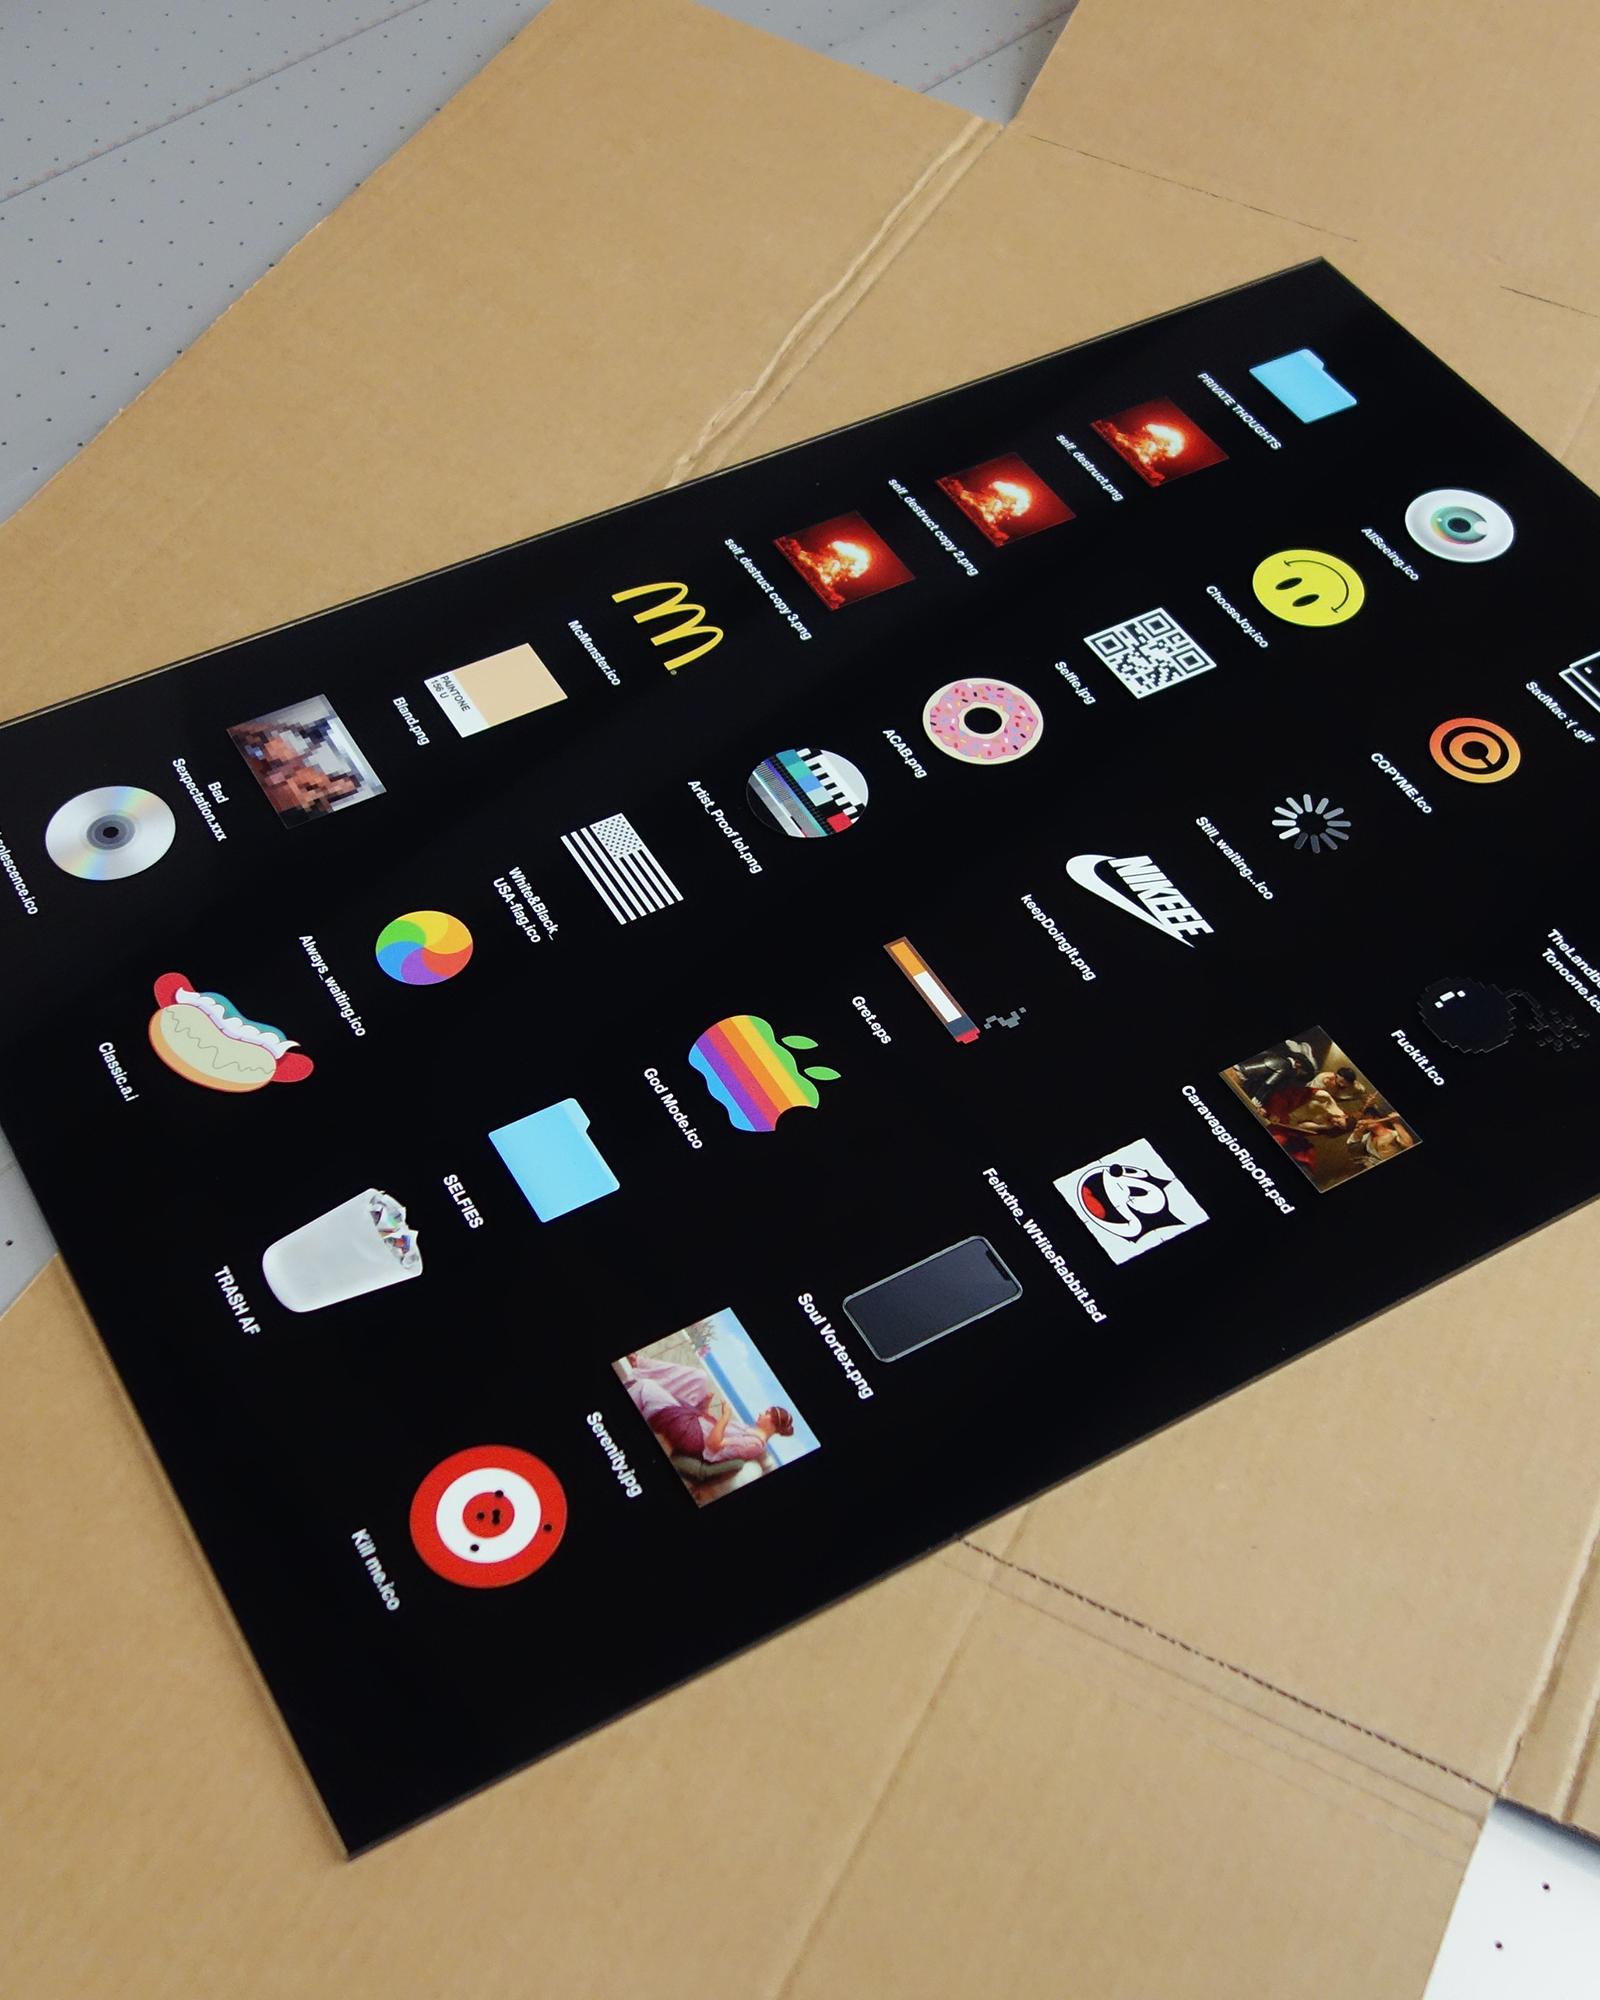 Desktop 001 - Detail